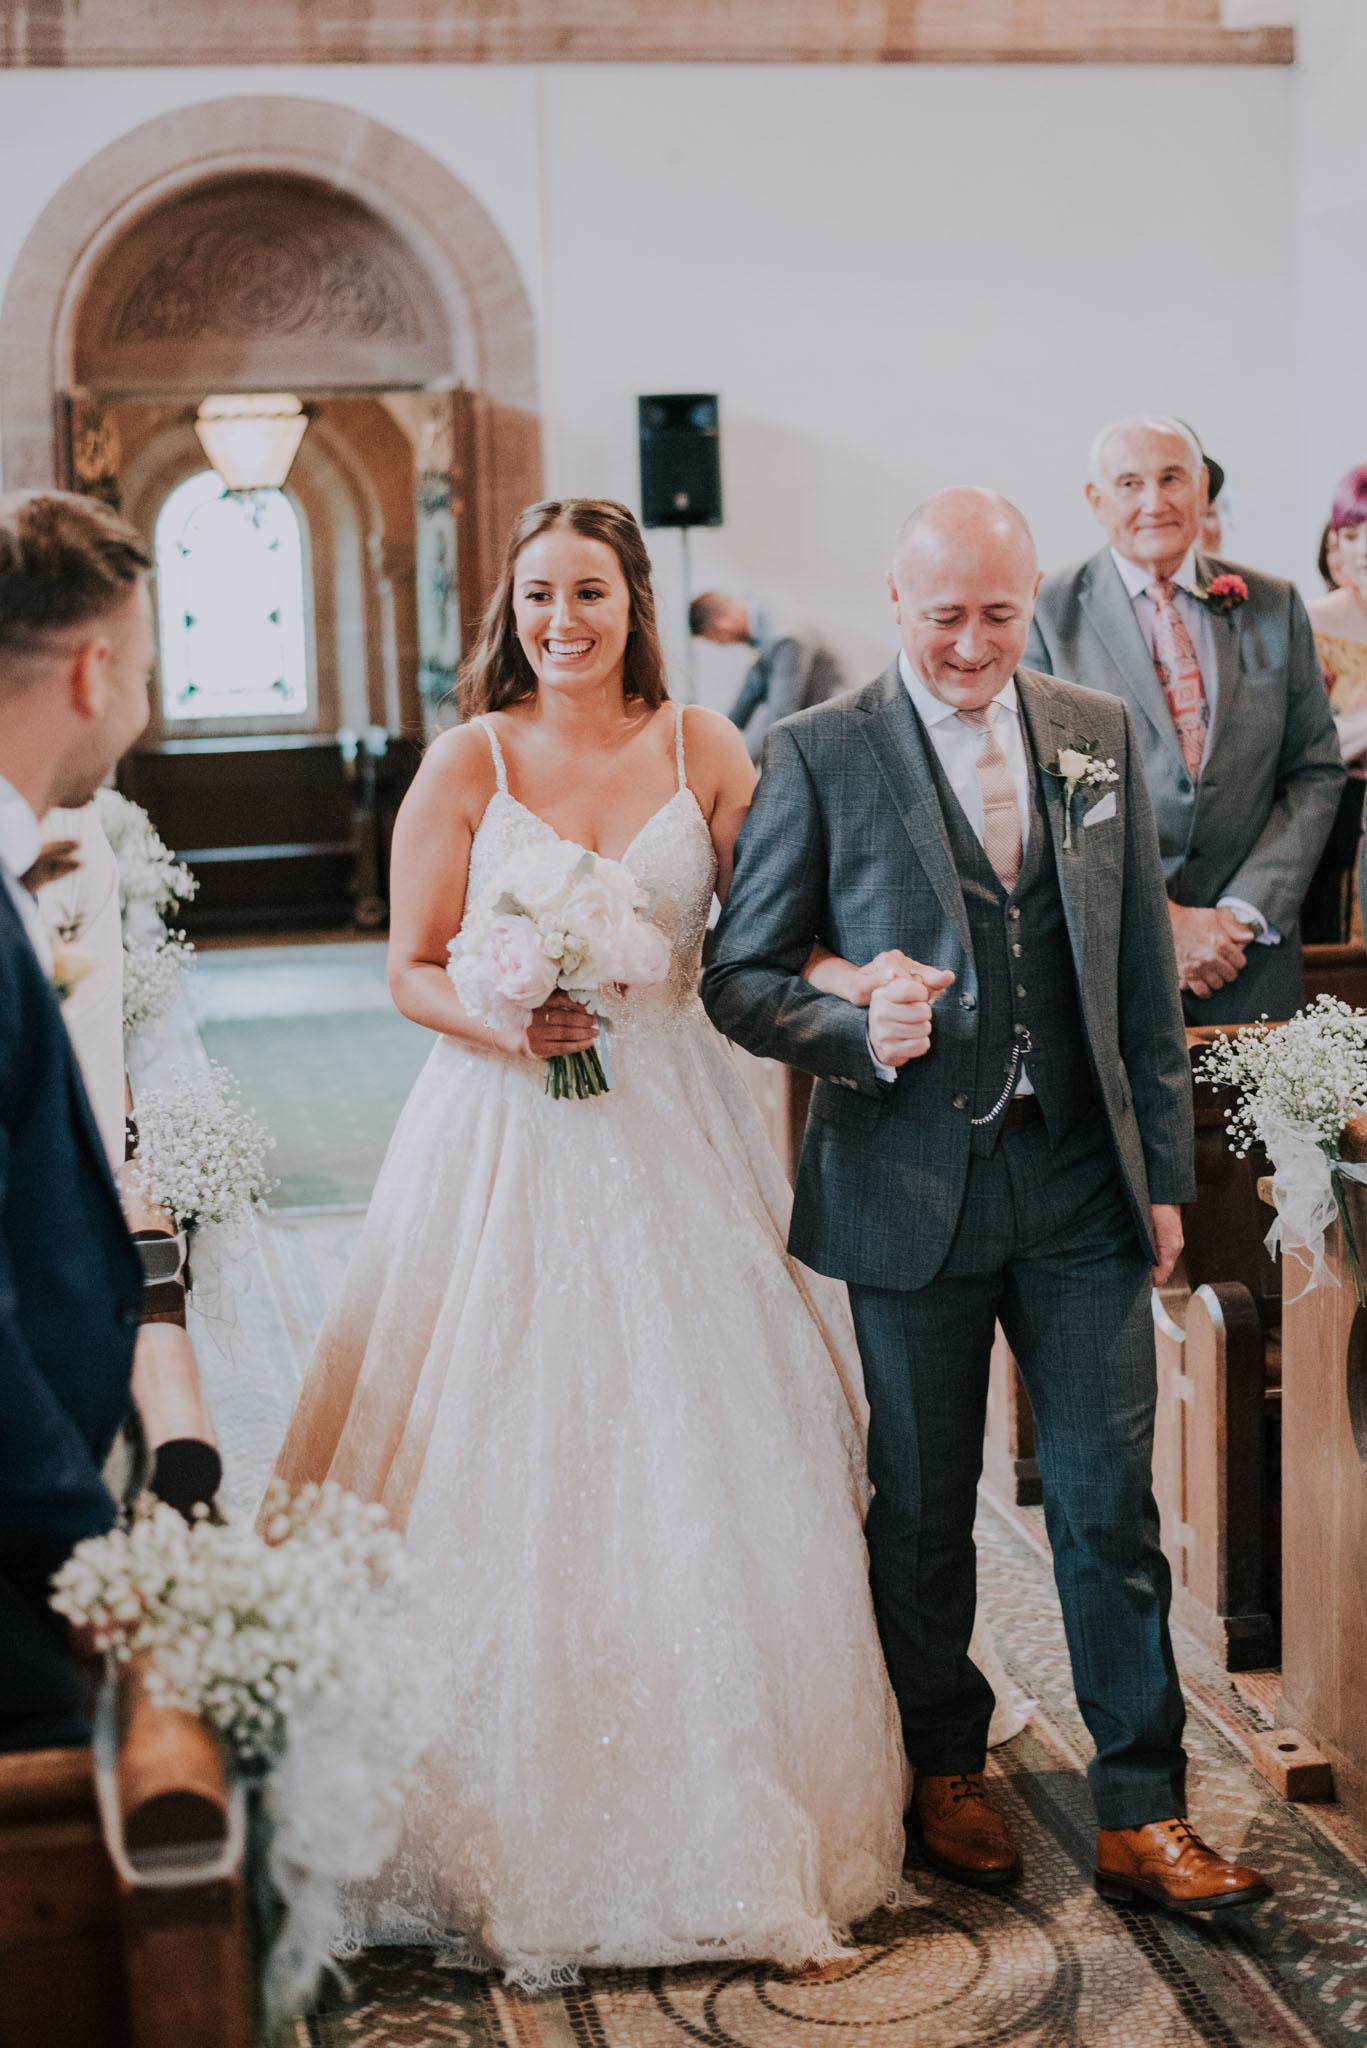 wedding-photographer-glewstone-court-hereford-scott-stockwell-photography165.jpg